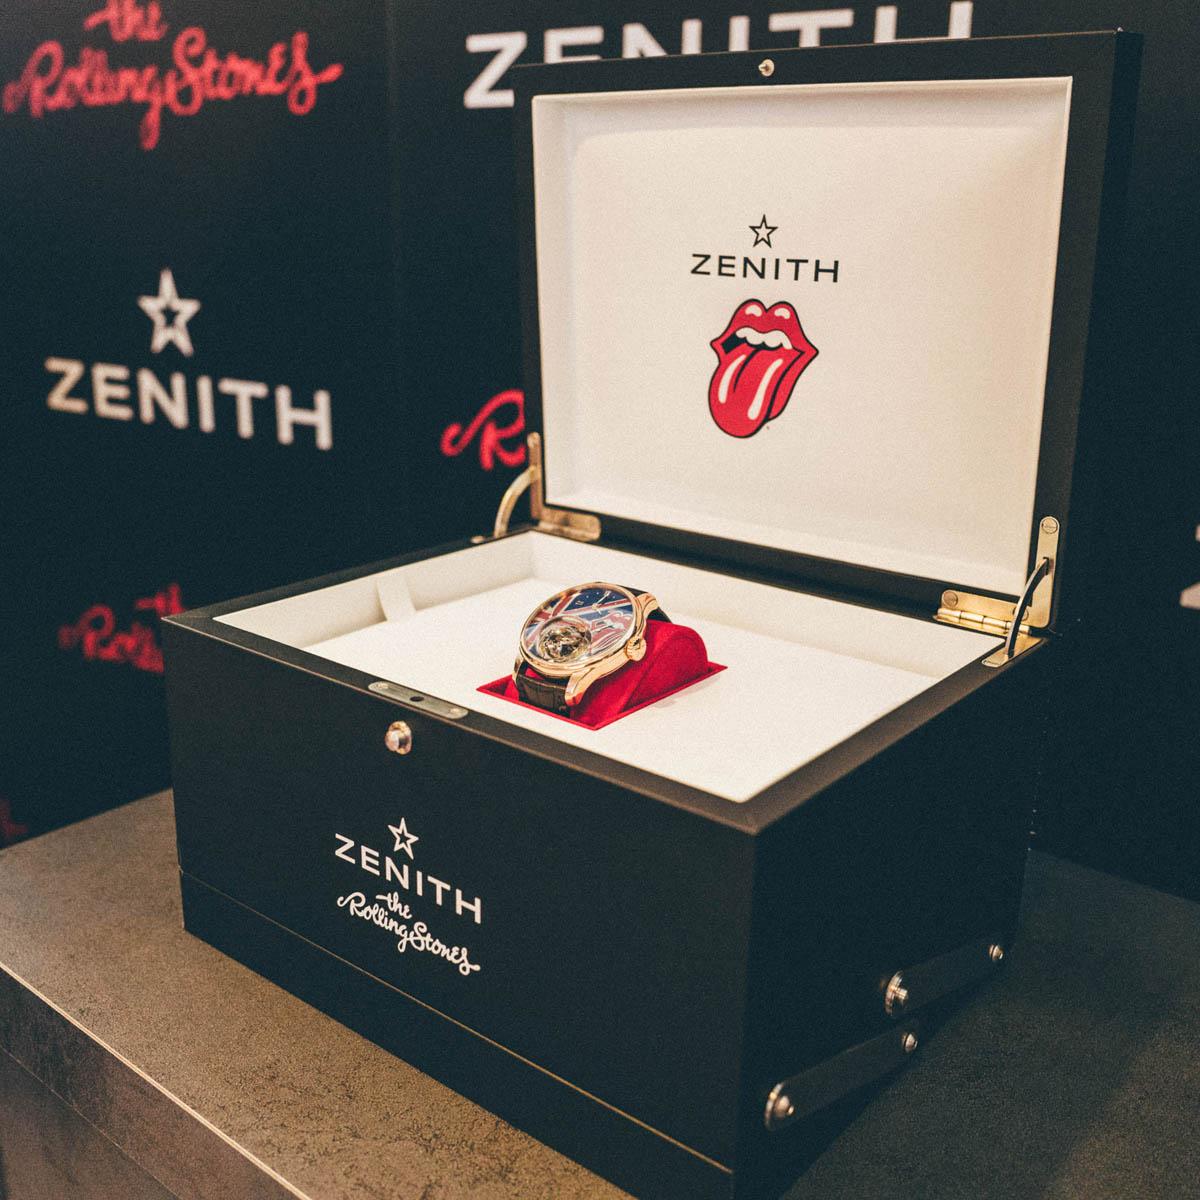 La Cote des Montres : Photo - Zenith Academy Christophe Colomb tribute to The Rolling Stones